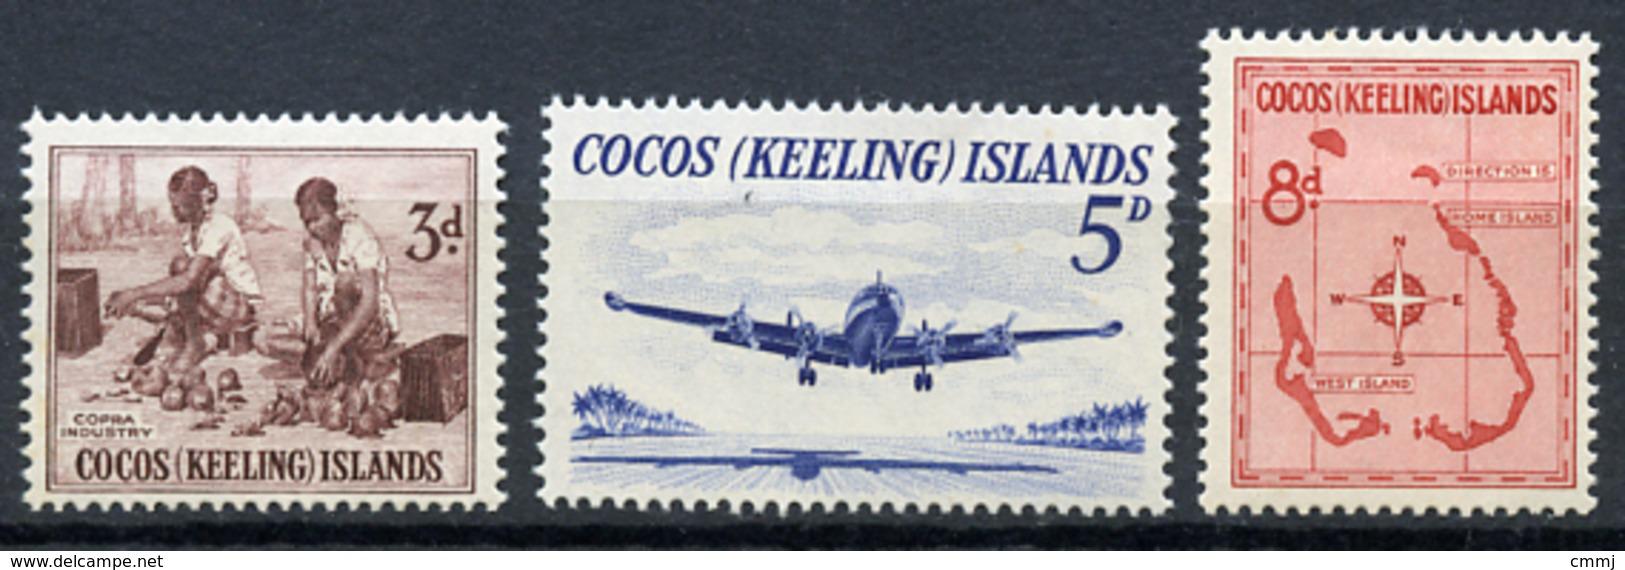 1963 - COCOS ISLAND - Catg. Mi. 1/3 - NH - (R-SI.331.713 -  24) - Isole Cocos (Keeling)